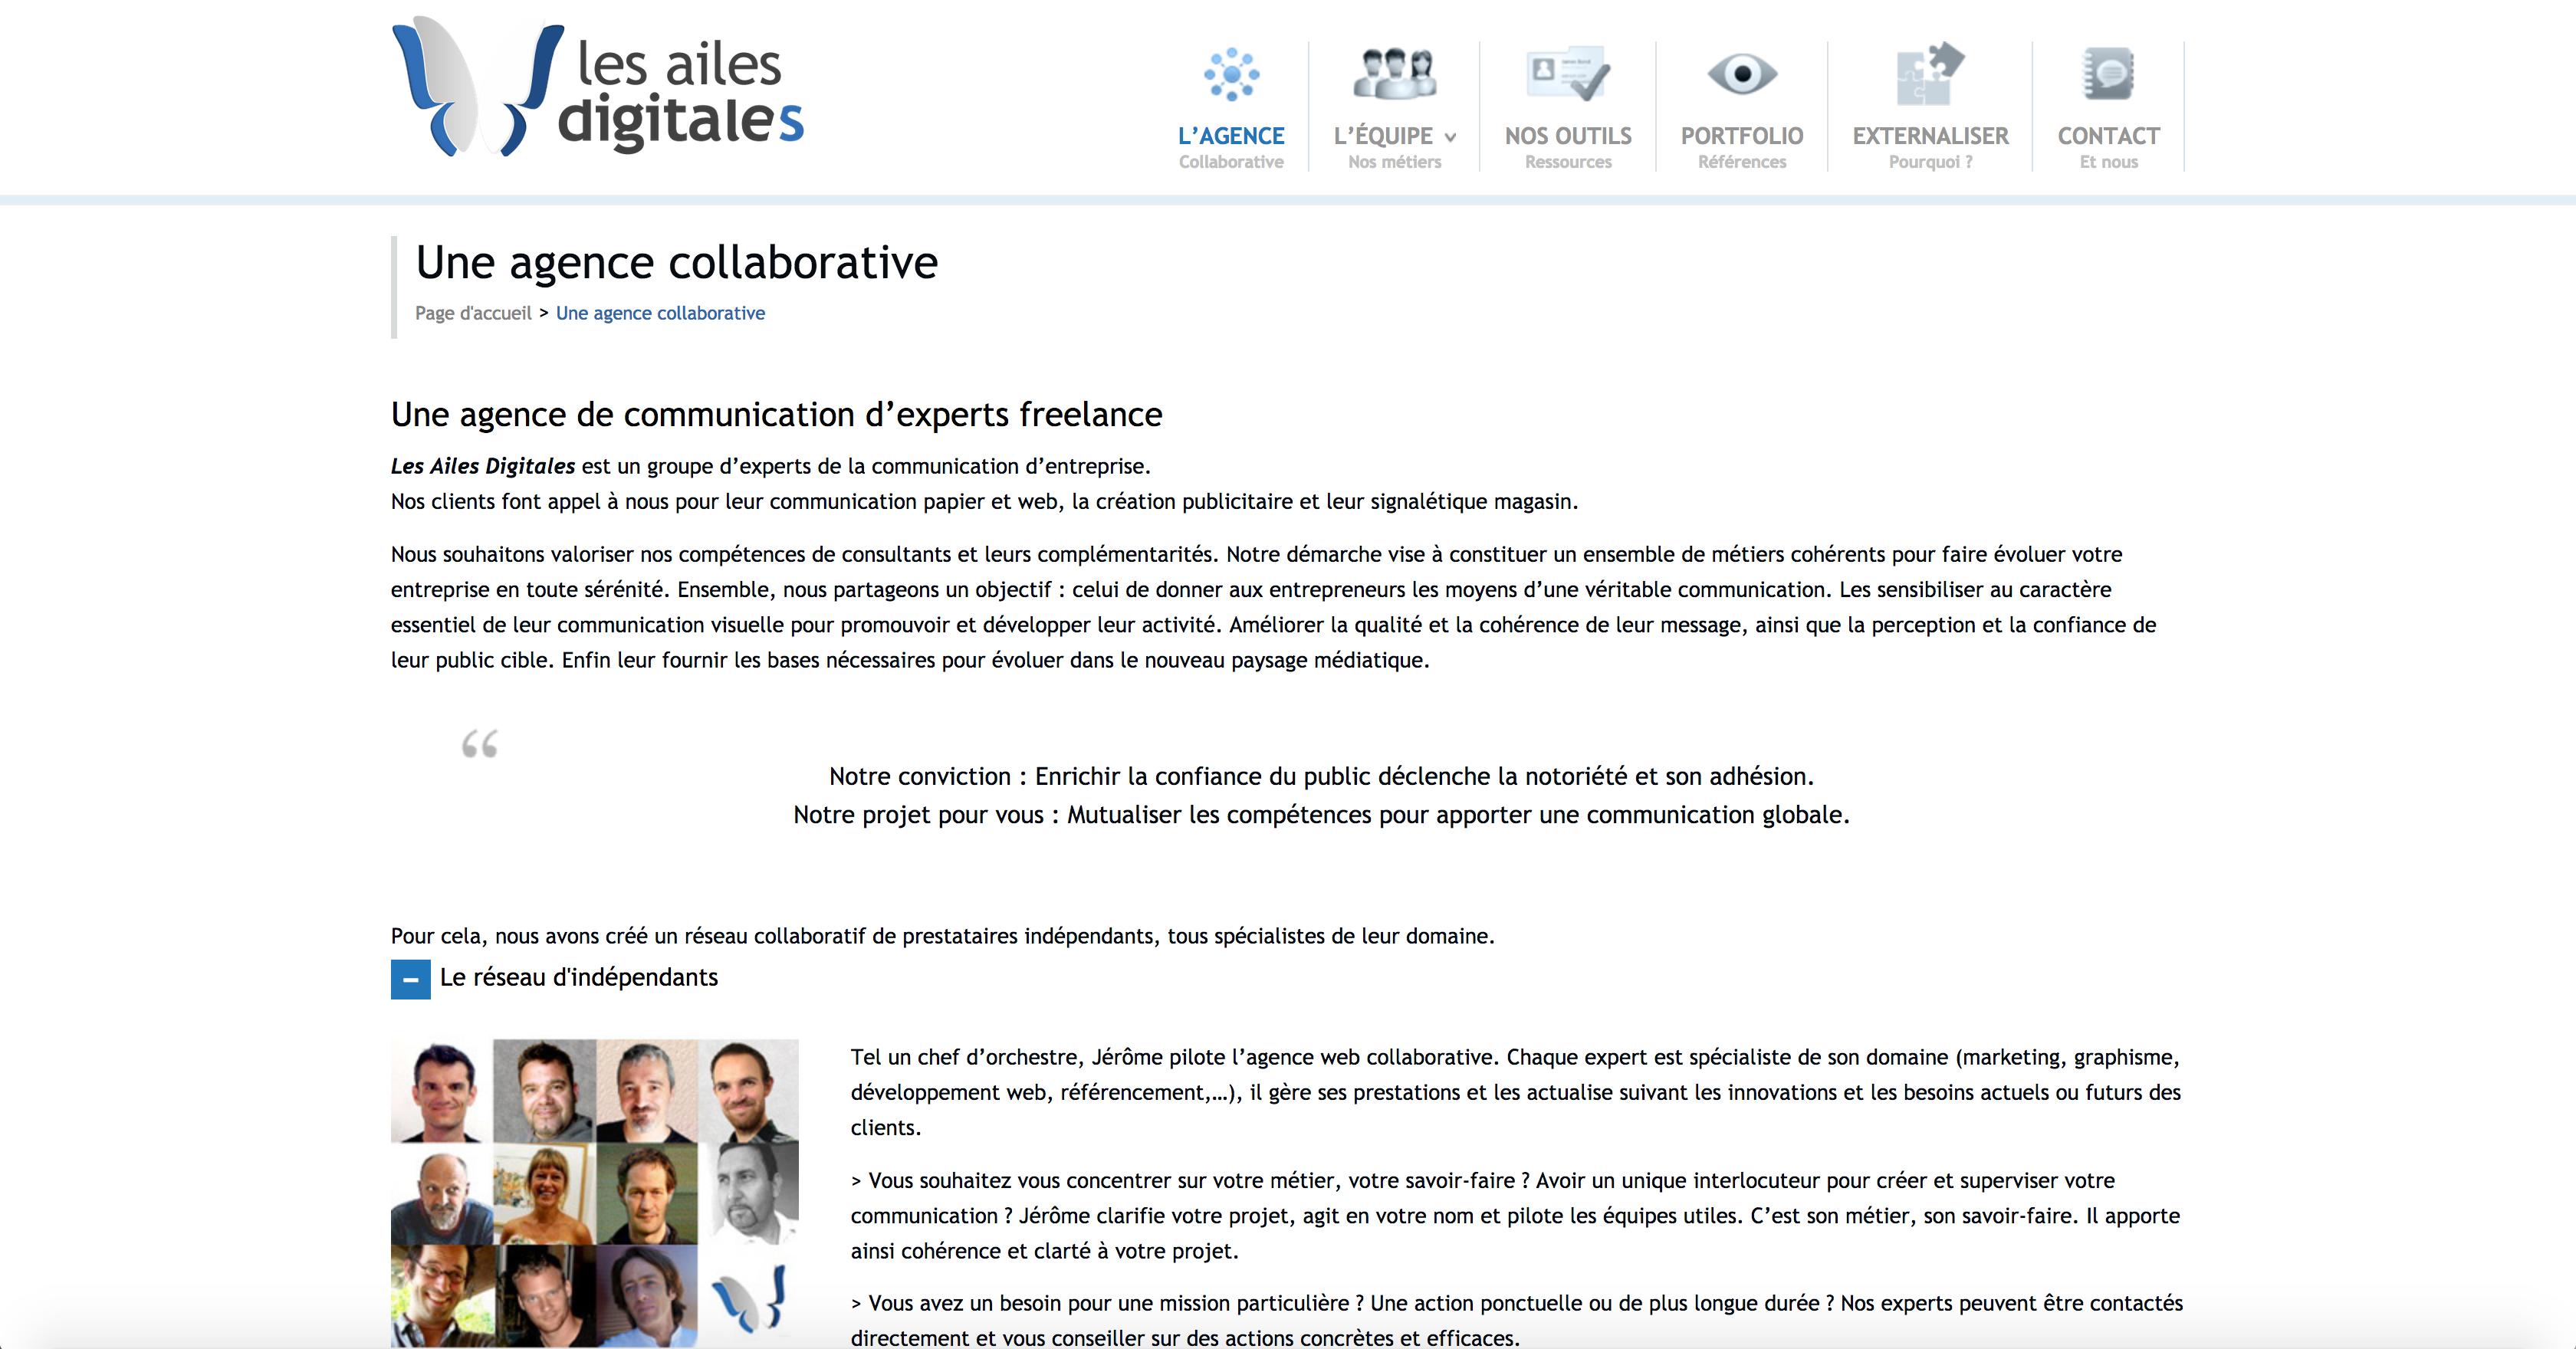 Une agence collaborative Les Ailes digitales